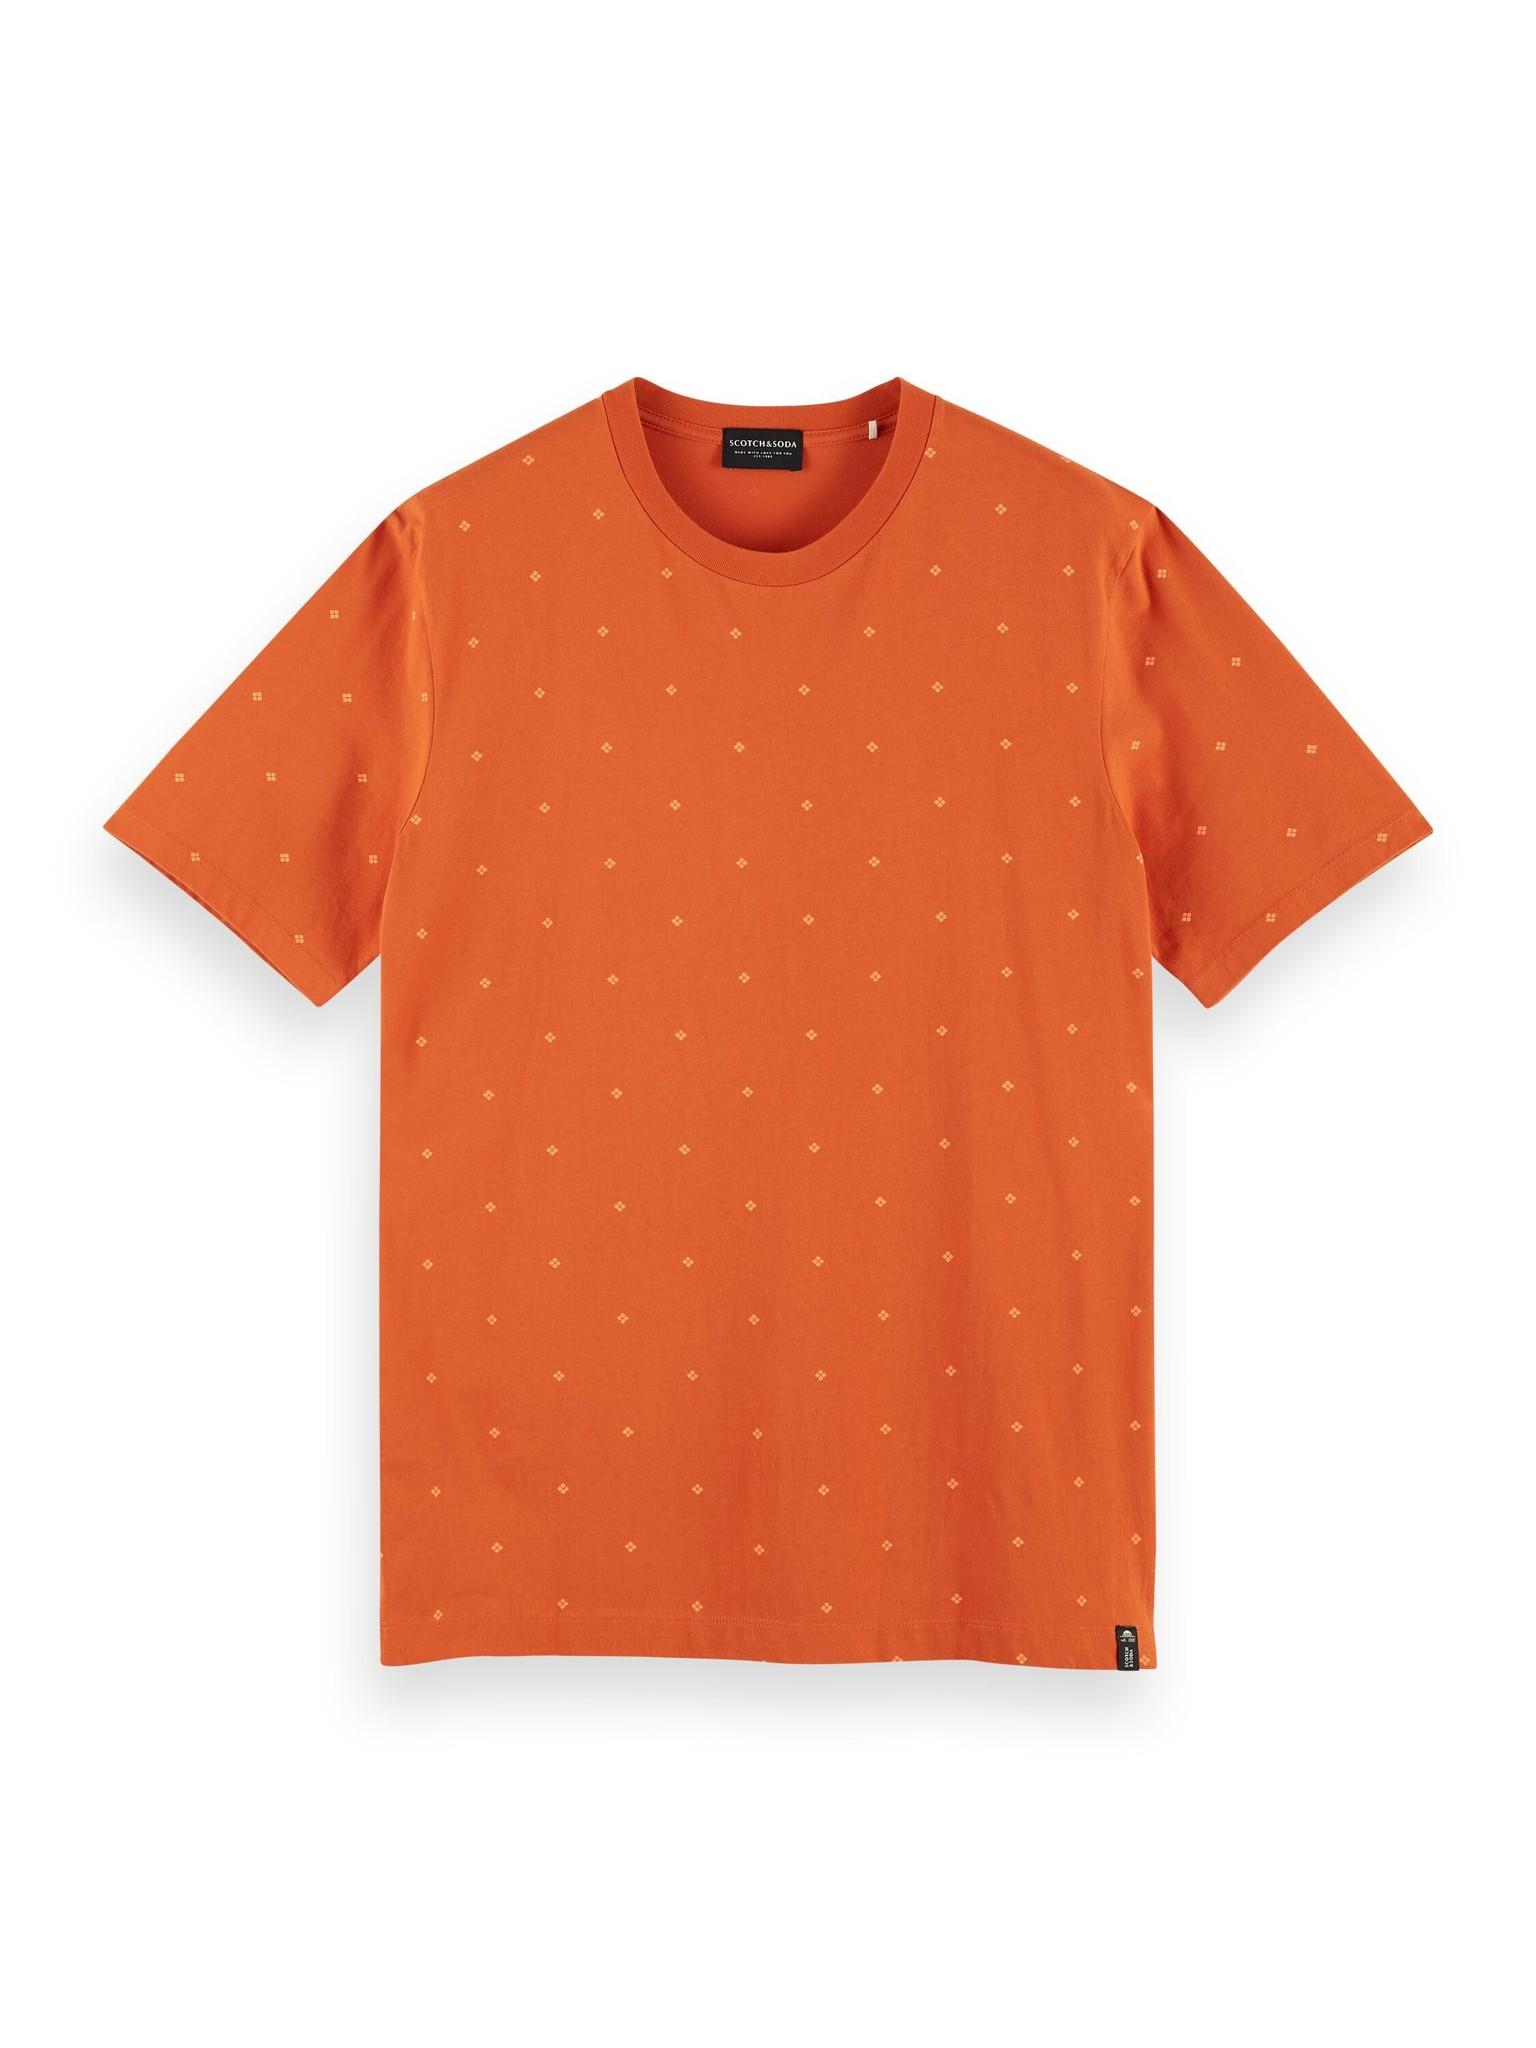 Scotch & Soda T-shirt Scotch & Soda 160854-0217